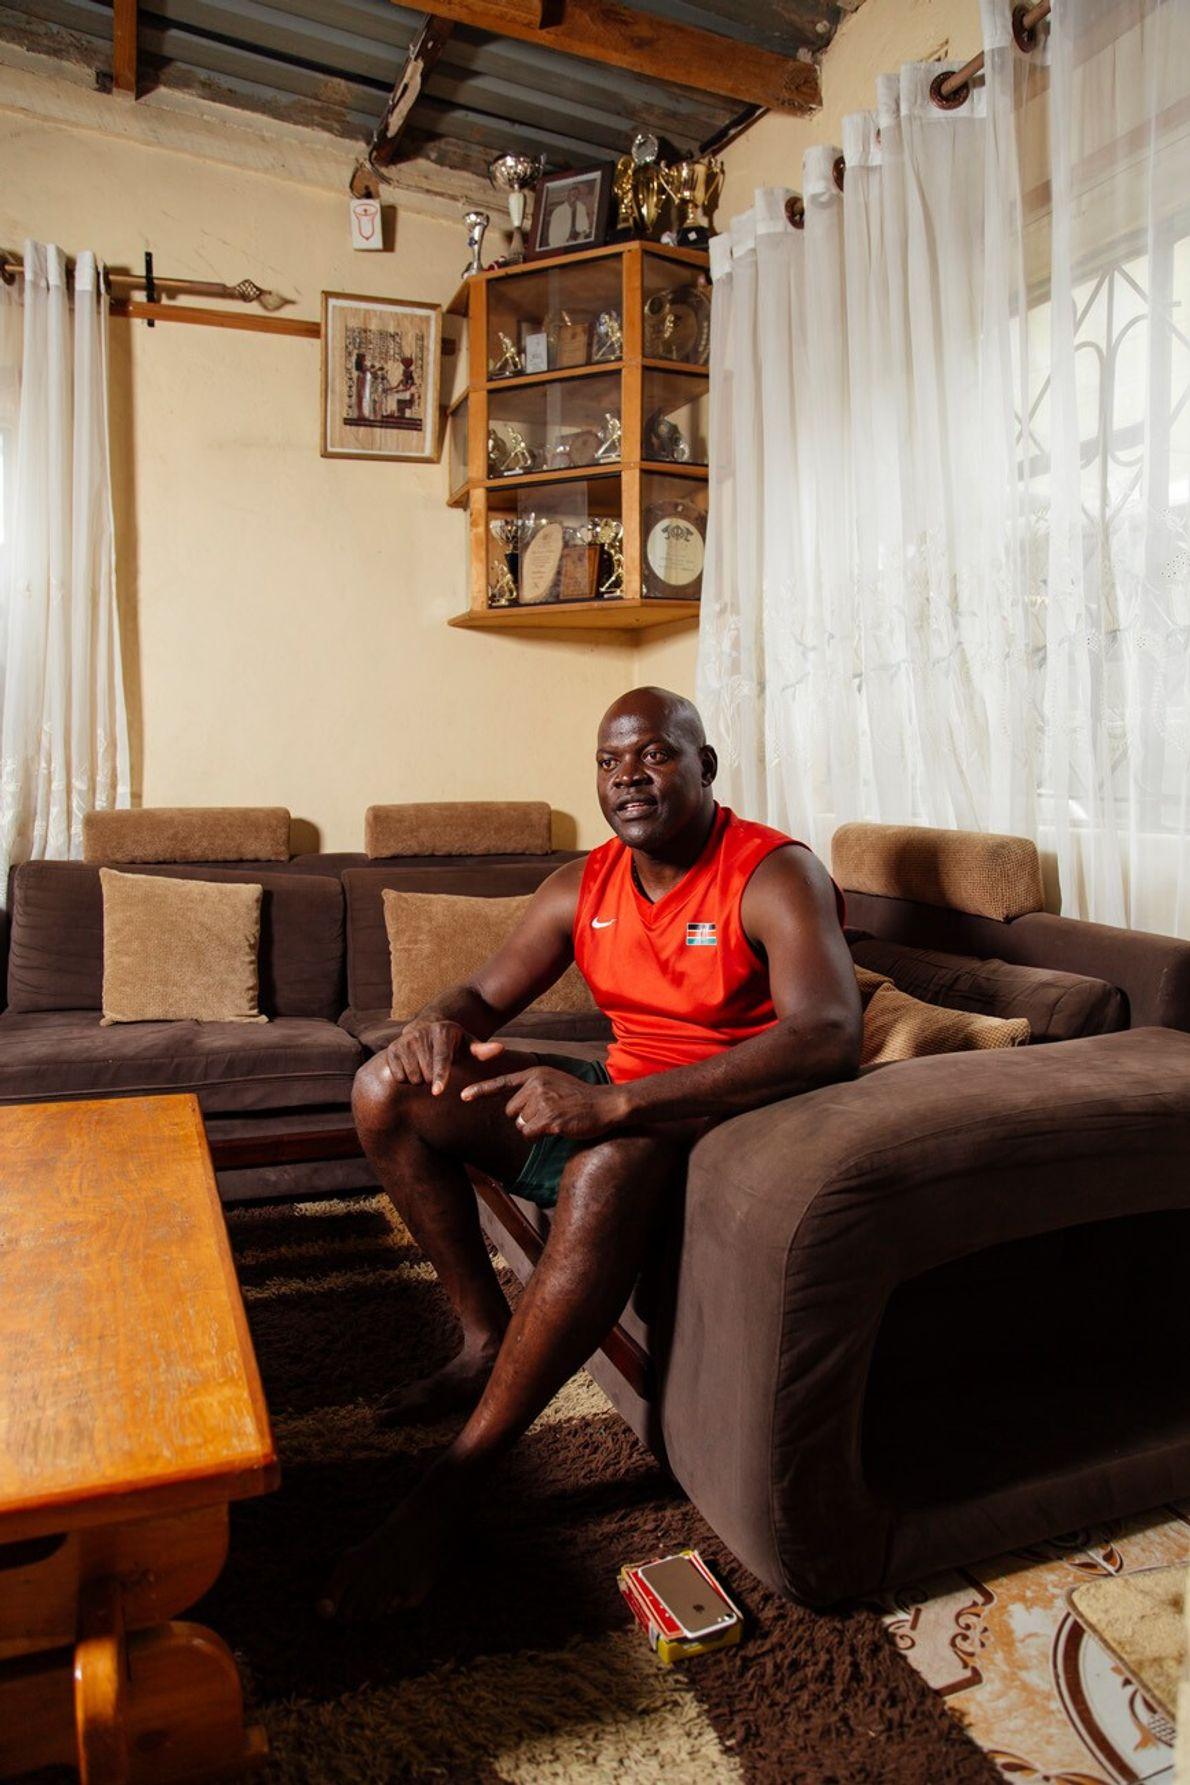 Meshack Senge was a member of Kenya's international hockey team from 1998 to 2007. He now ...